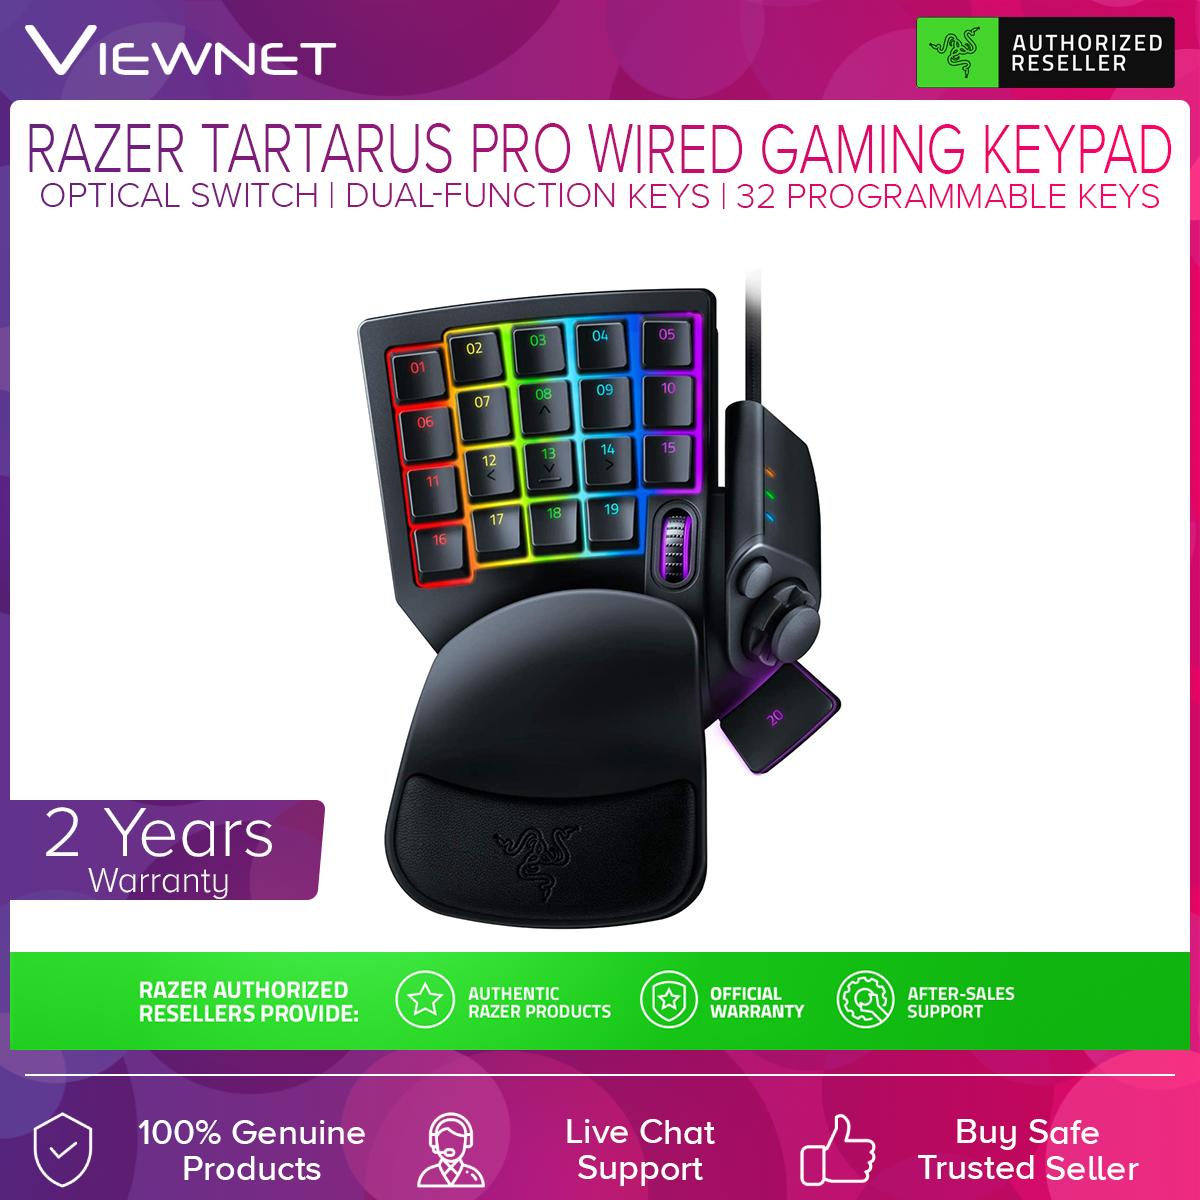 Razer Tartarus Pro Optical Gaming Keypad, RGB, Dual-function keys, 8 Quick-toggle profiles, 32 Programmable keys